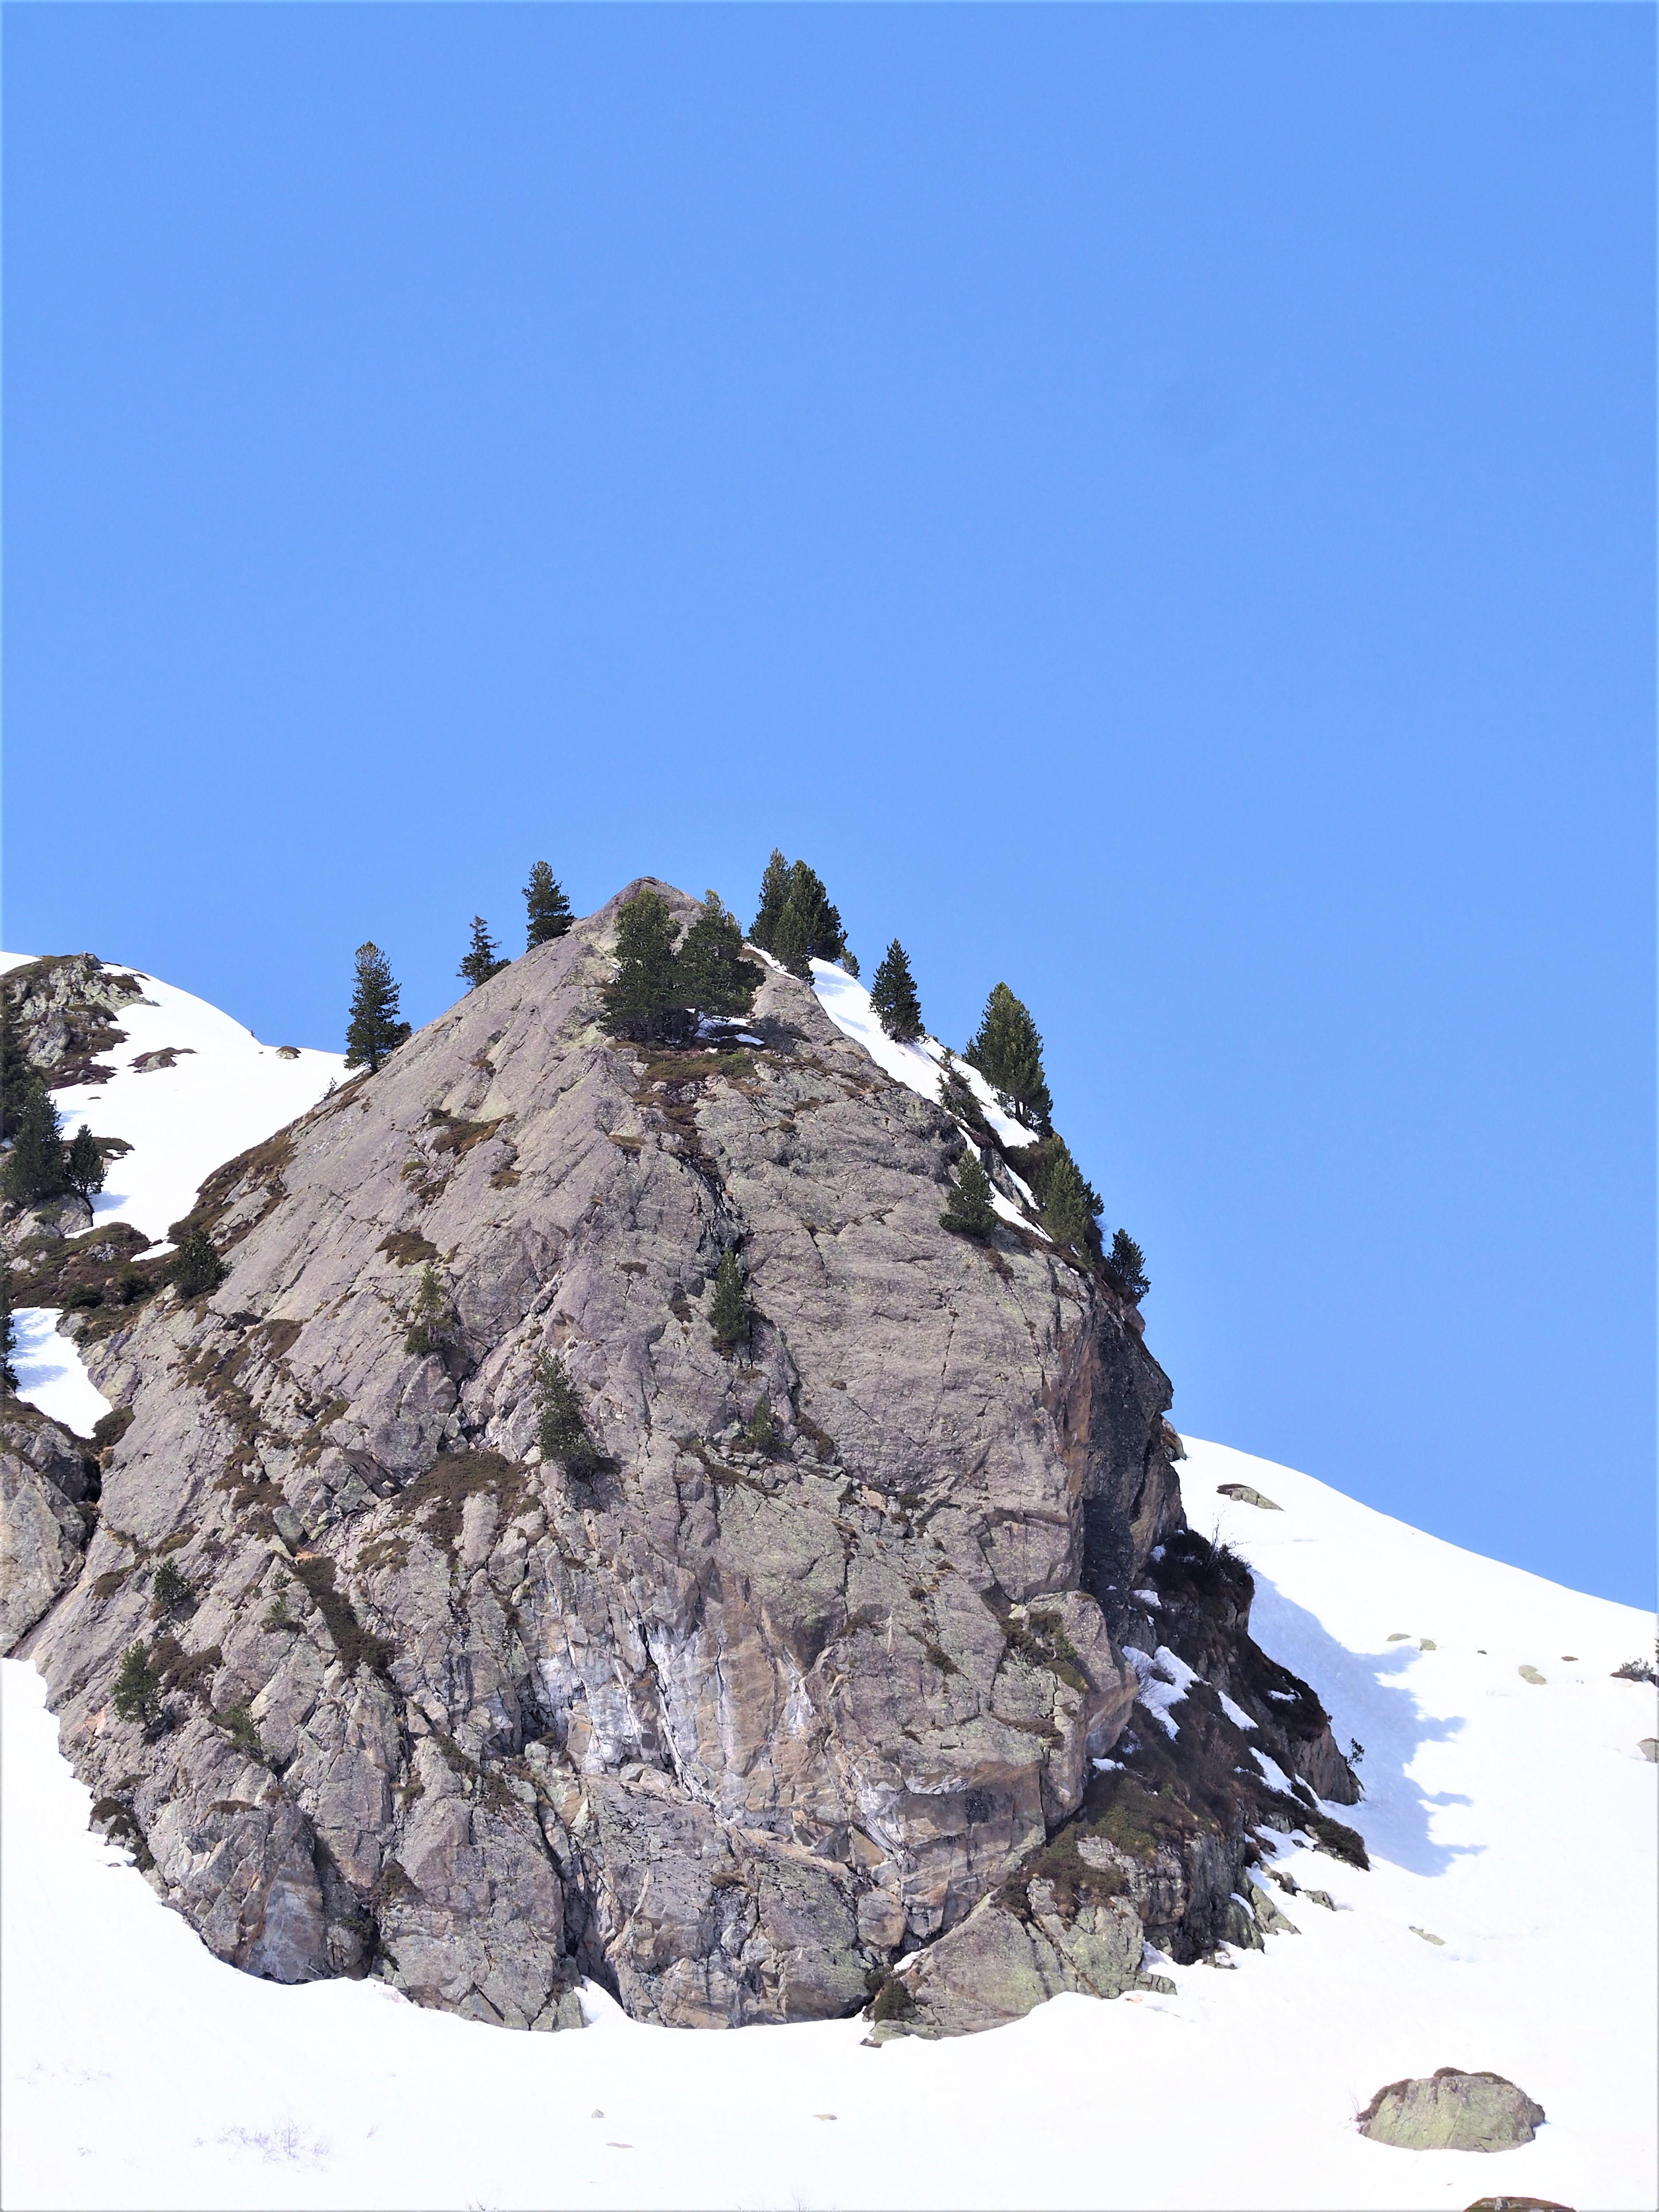 chamonis vallée du Mont Blanc randonnée